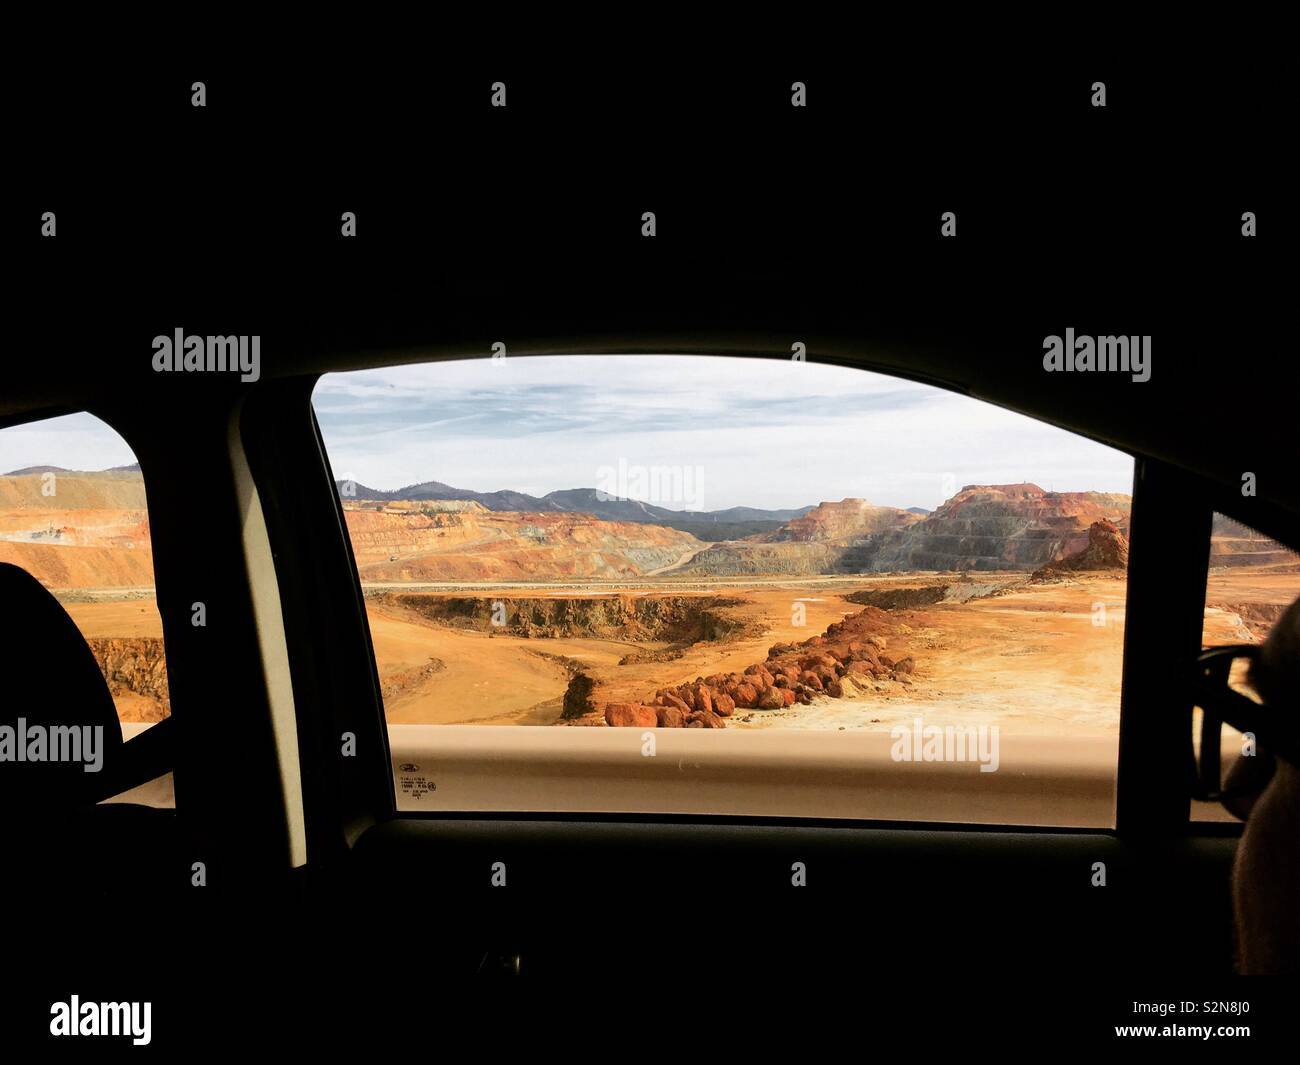 Tello mine shot from inside car - Stock Image